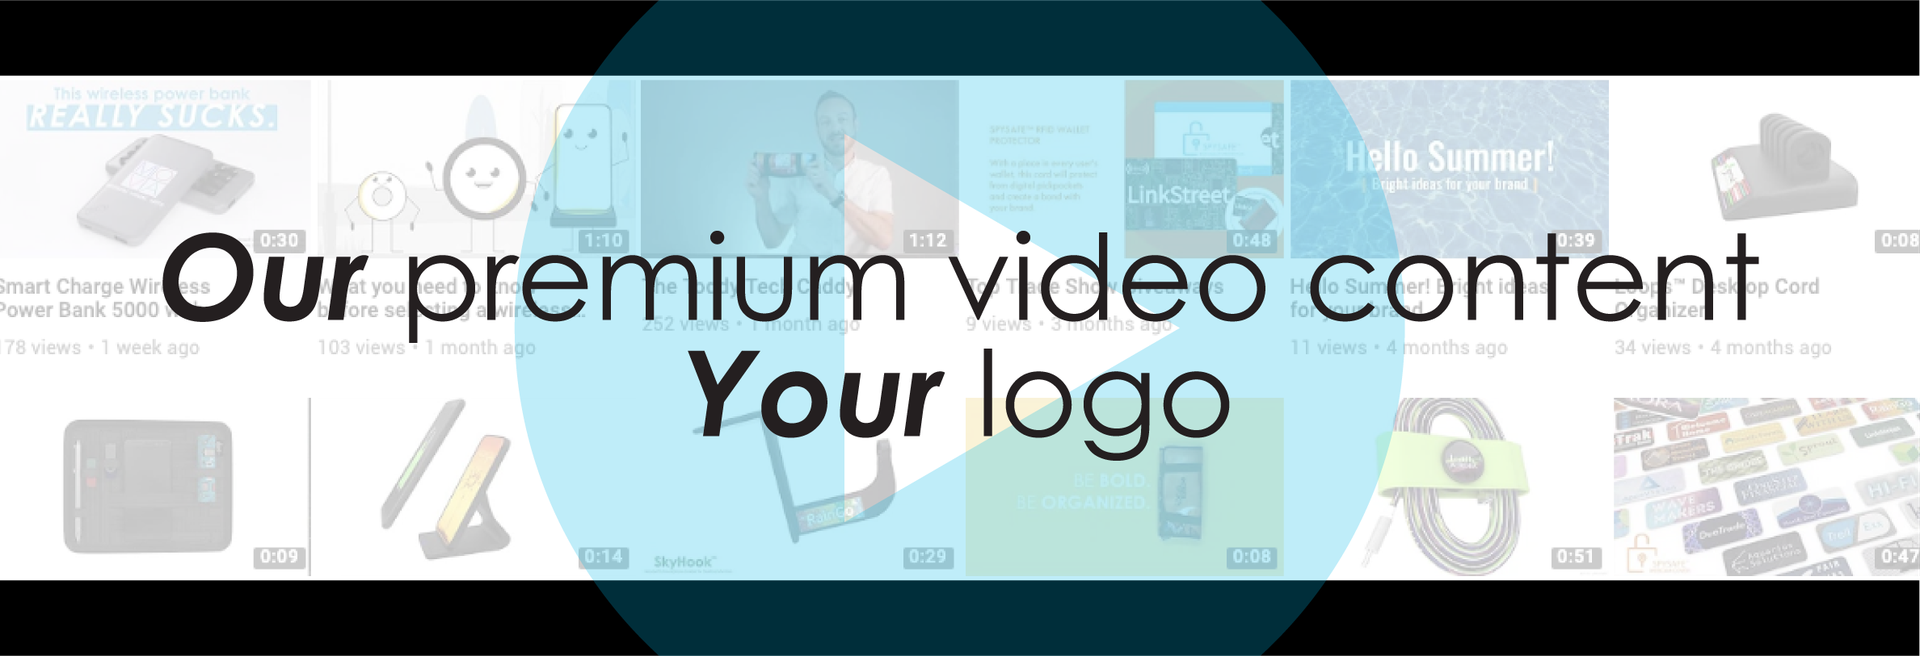 Our Premium Video Content - Your Logo